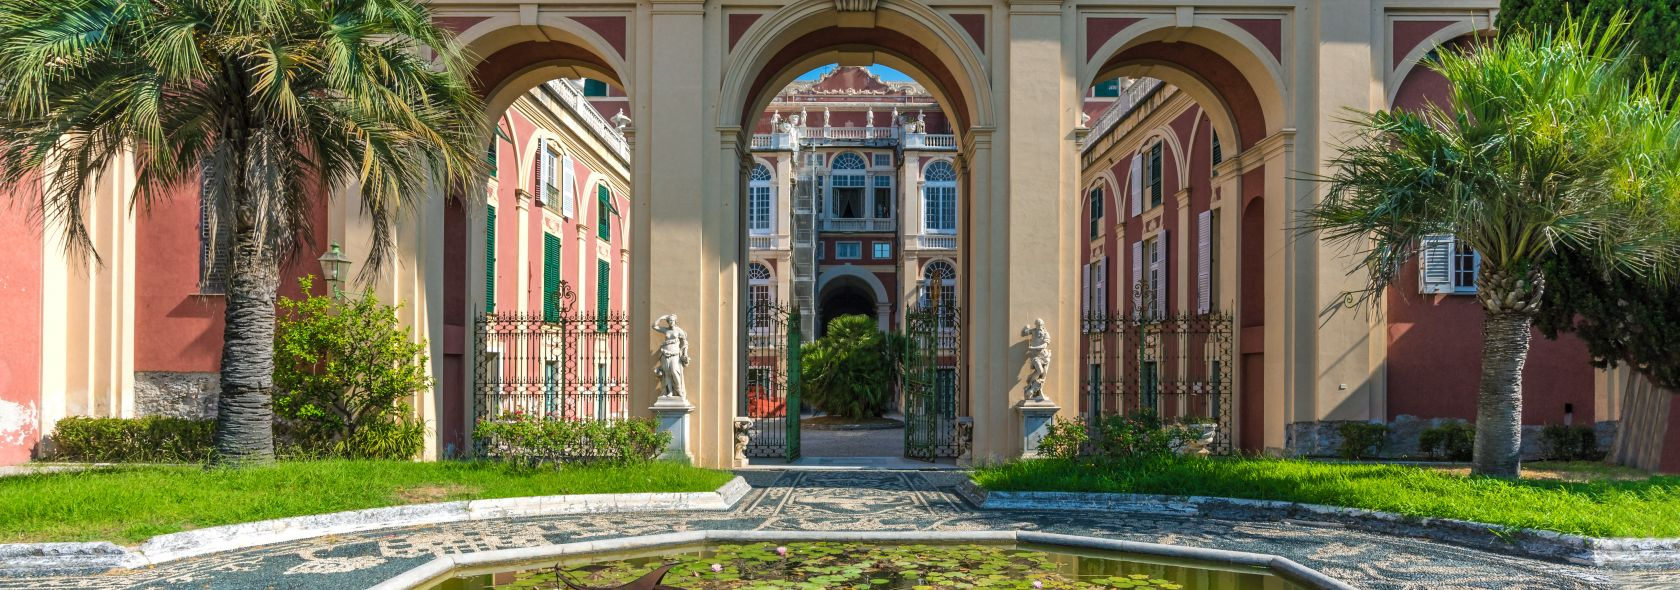 Palazzo Reale - vista sul giardino